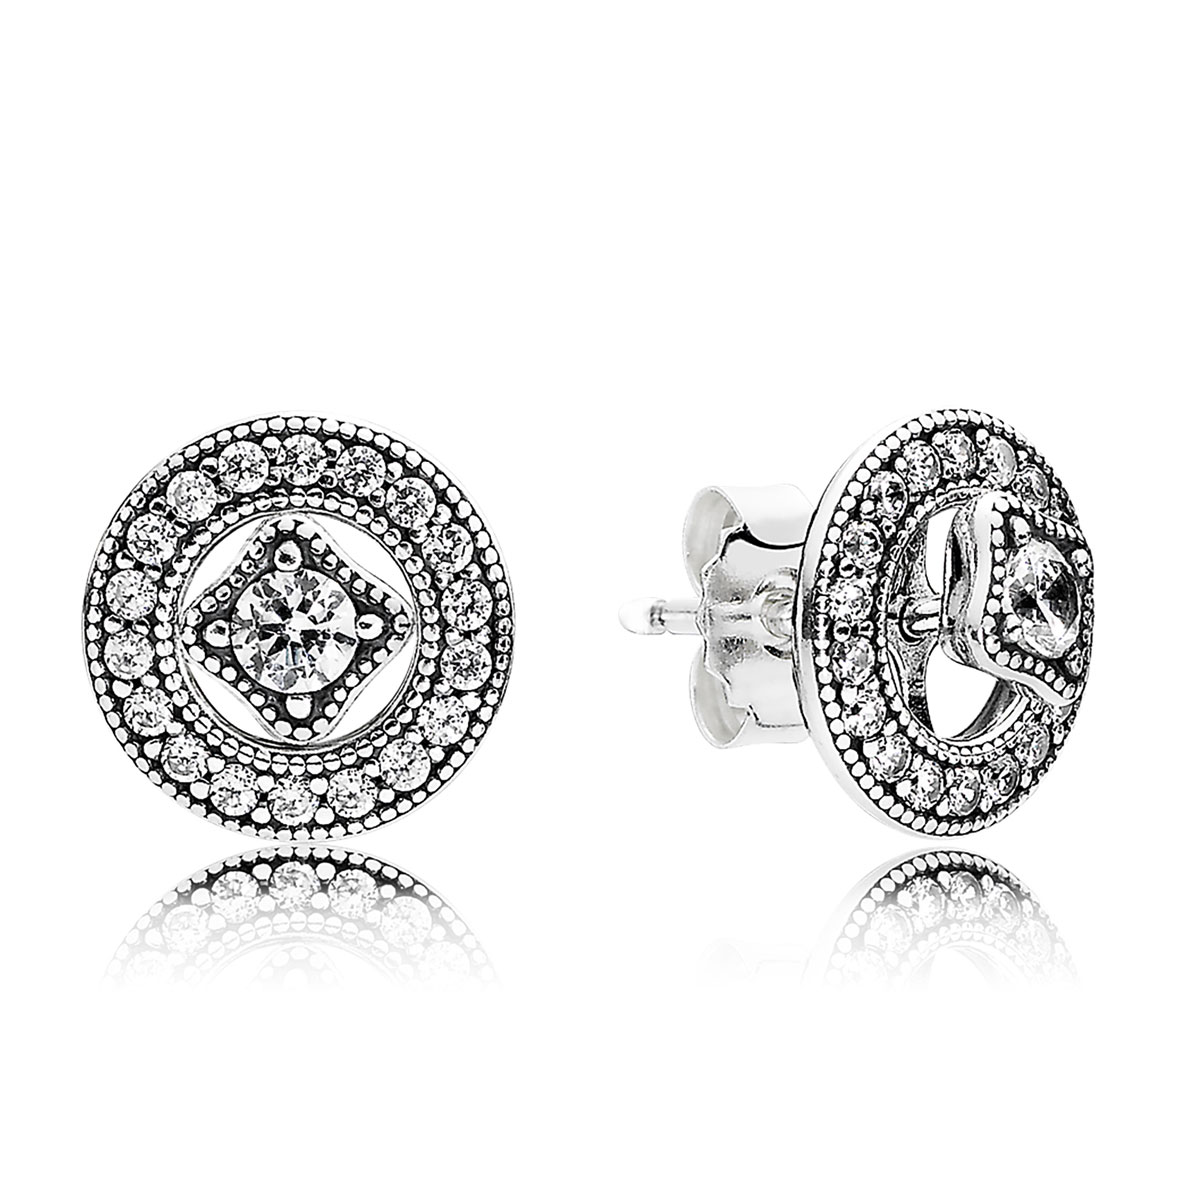 silver pandora earrings